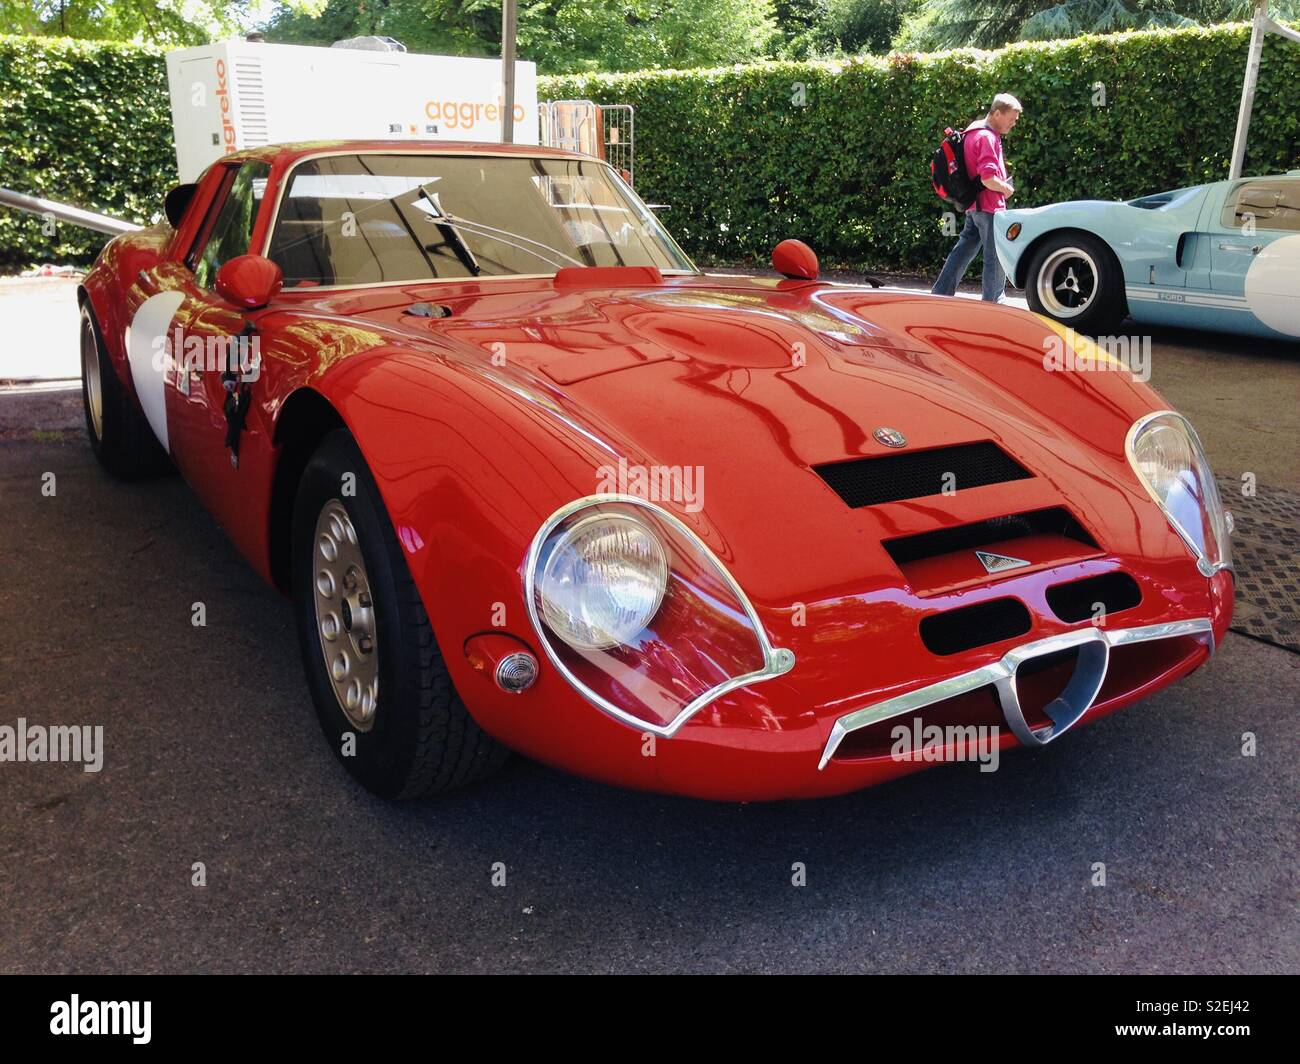 Alfa Romeo Classic Car Stock Photos & Alfa Romeo Classic